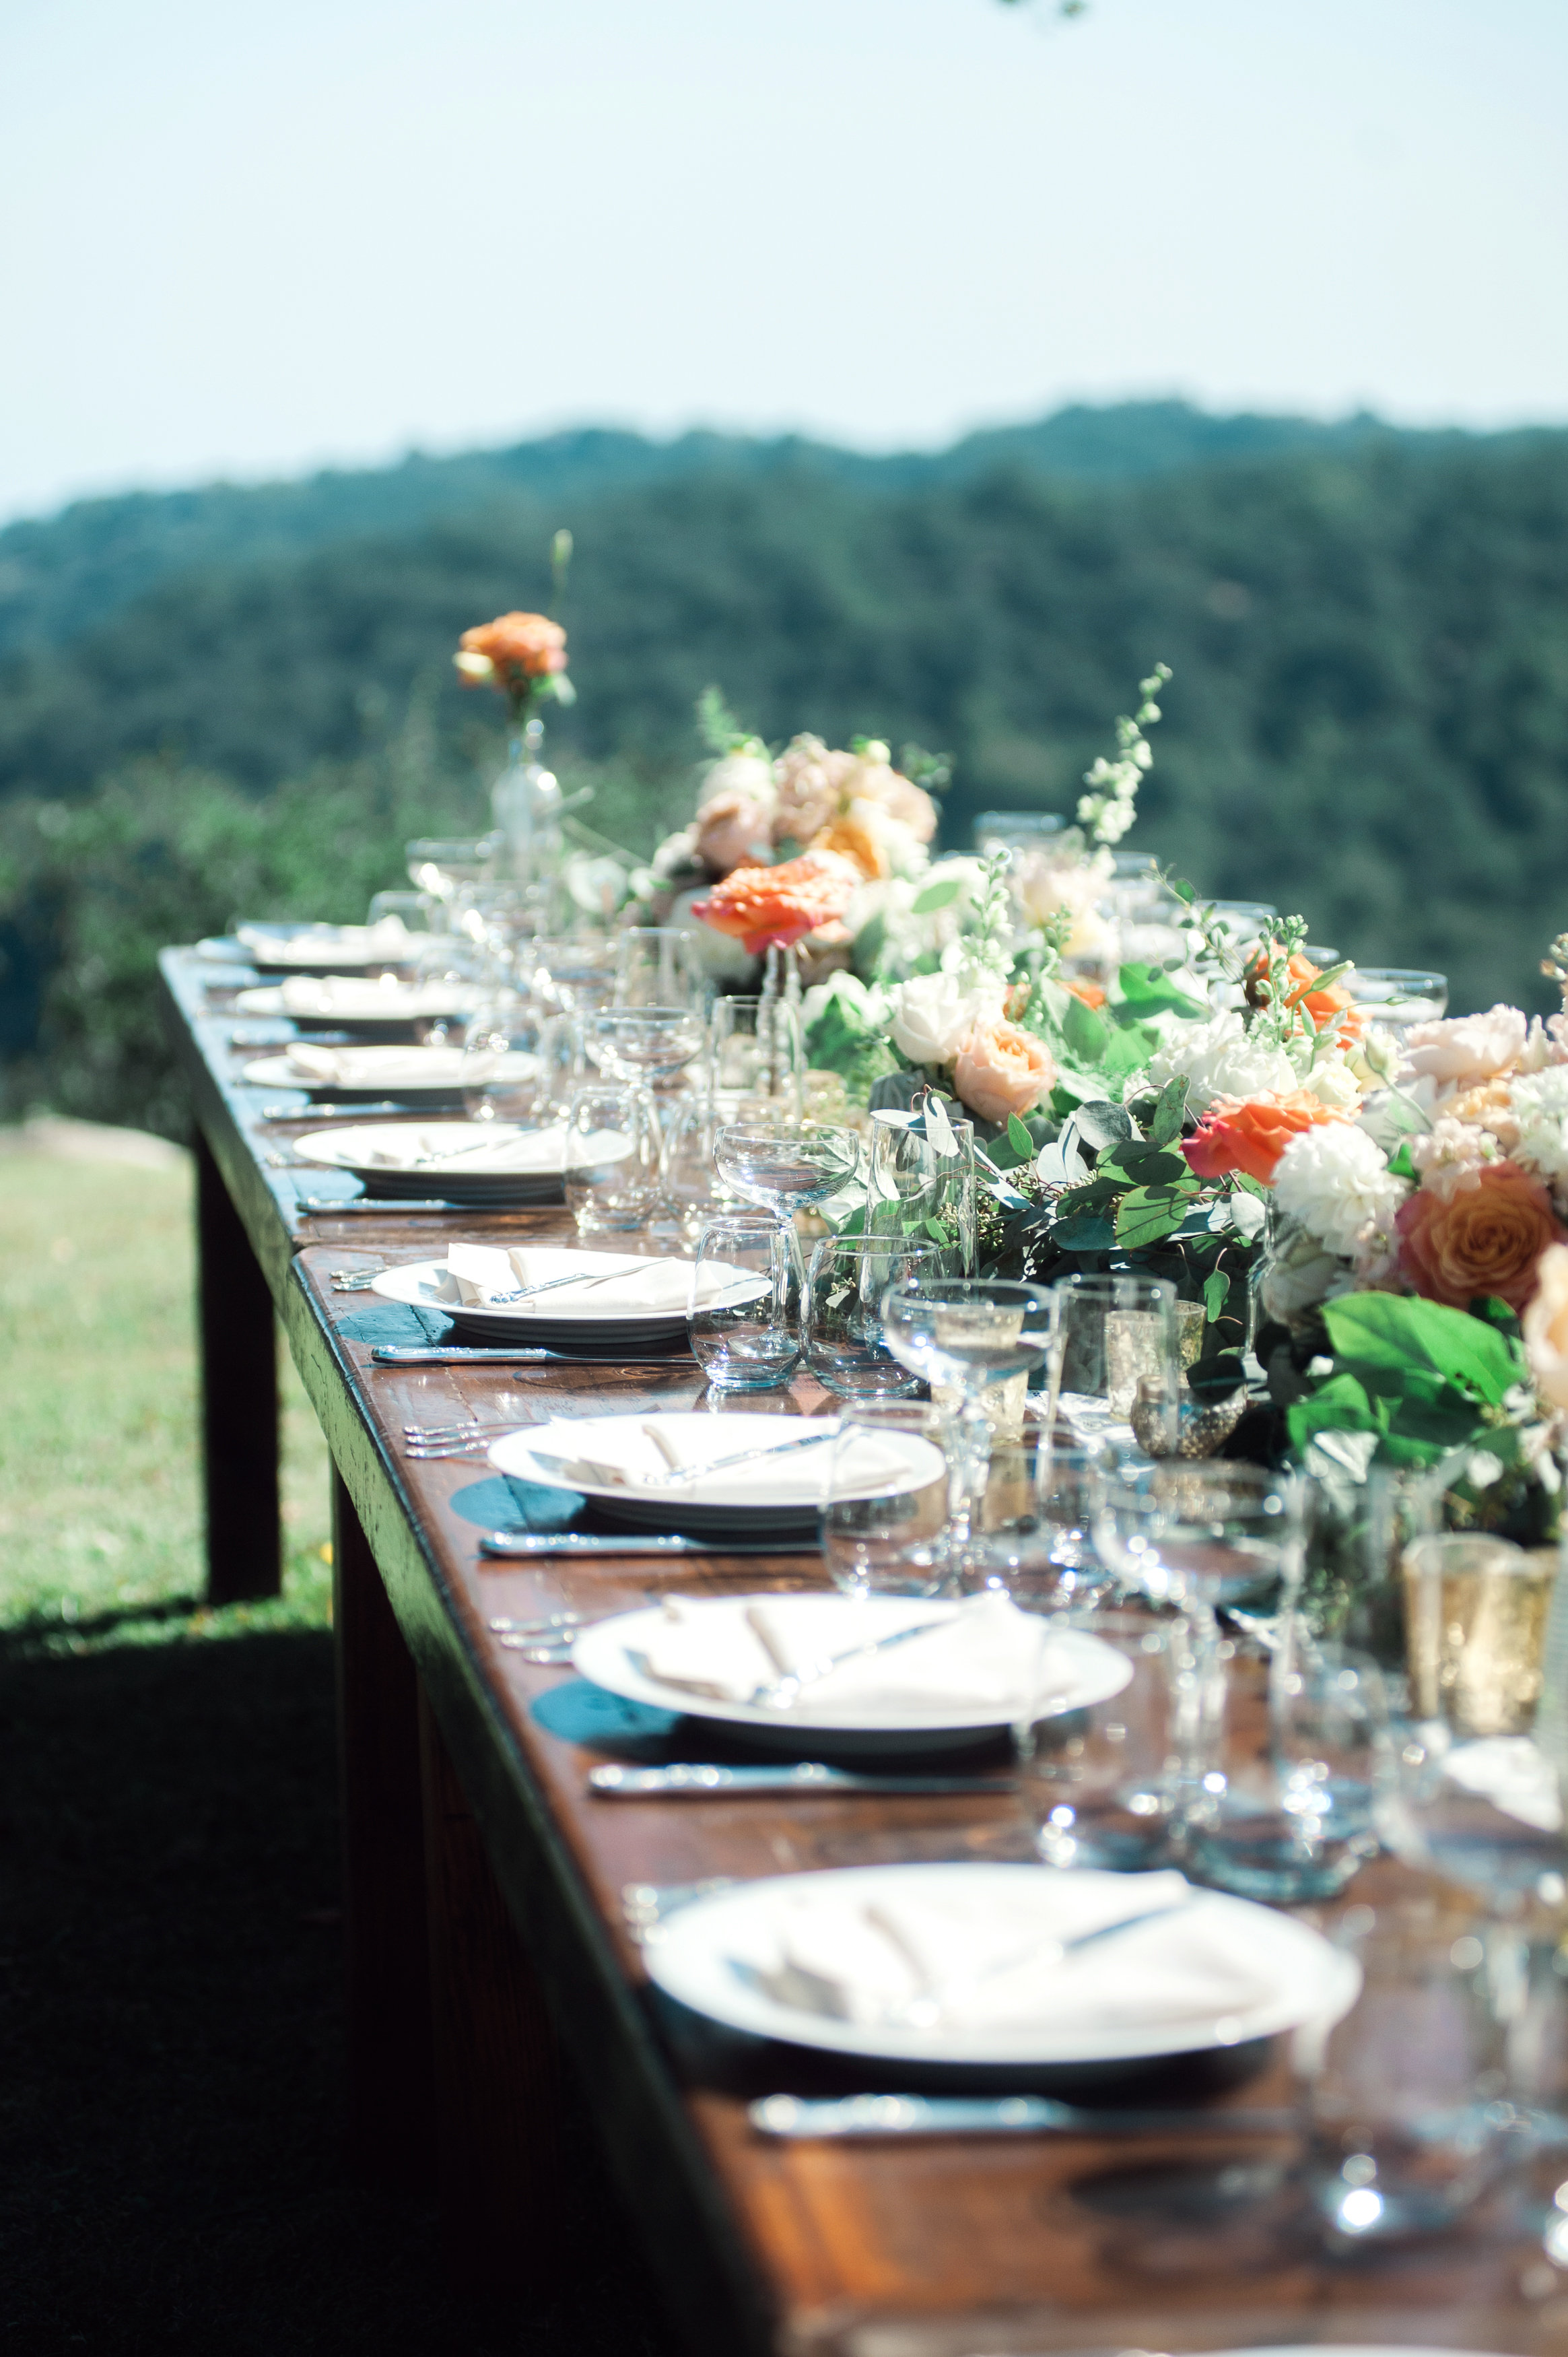 santabarbarawedding.com | Wisteria Lane Flroal Design Studio | Bride and Groom | Garden Roses | Darkwood Farm Table Decor | Floral Runner